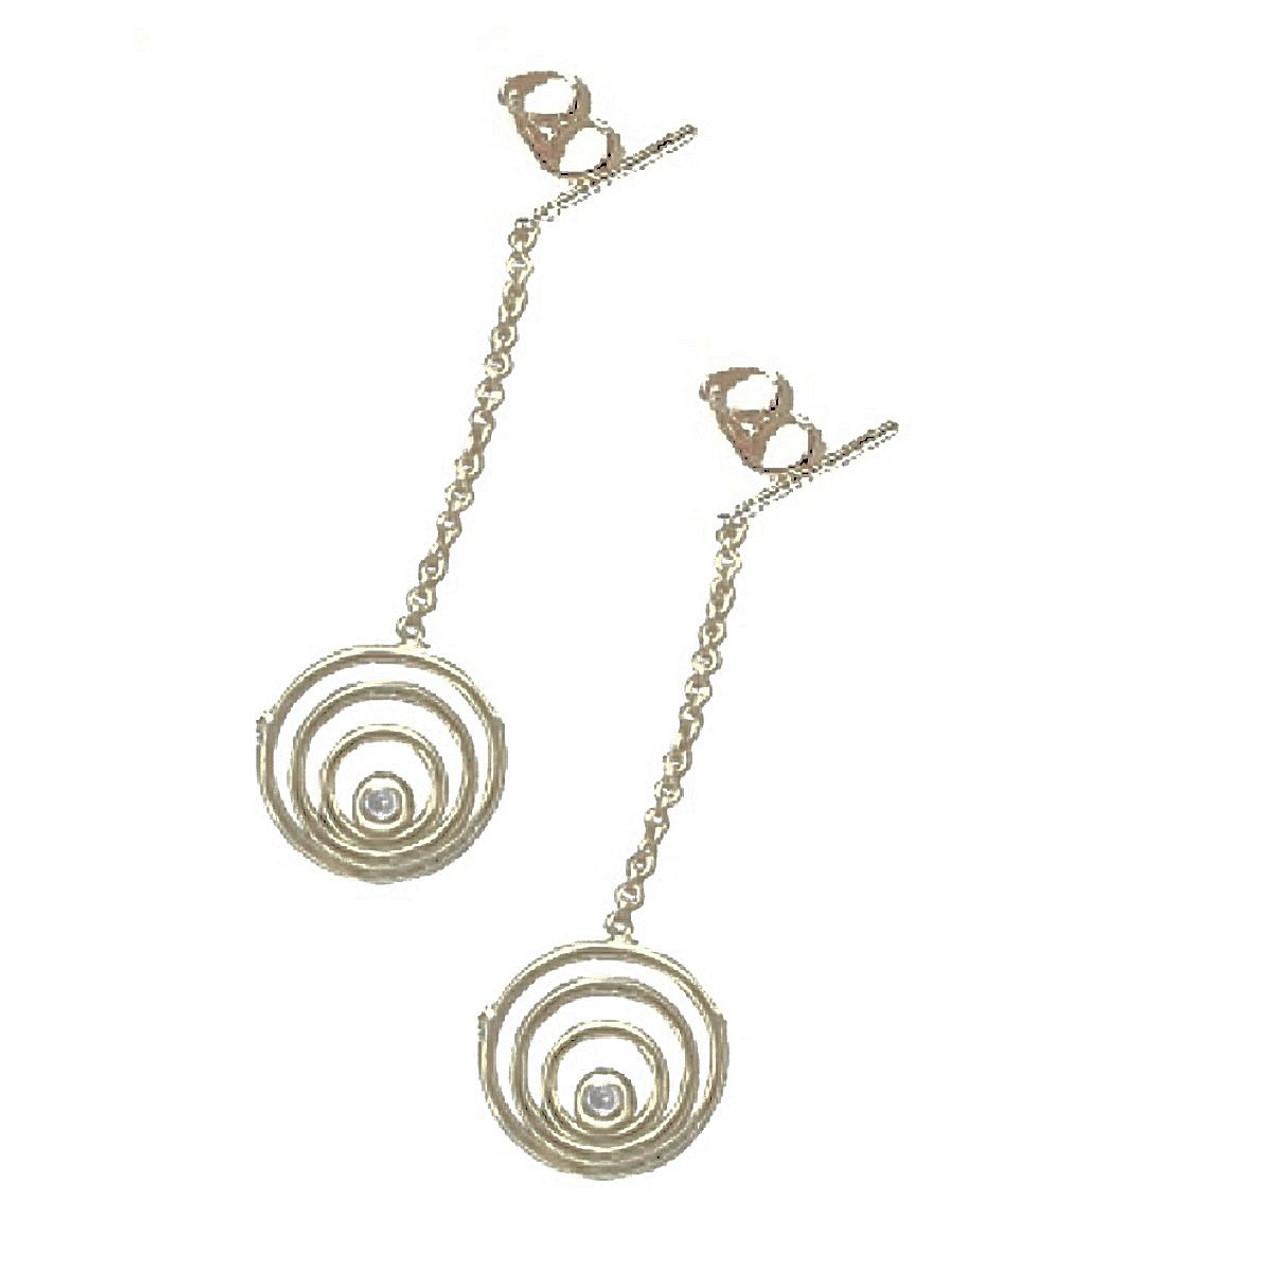 Karma Drop Earrings-Sterling silver with diamonds